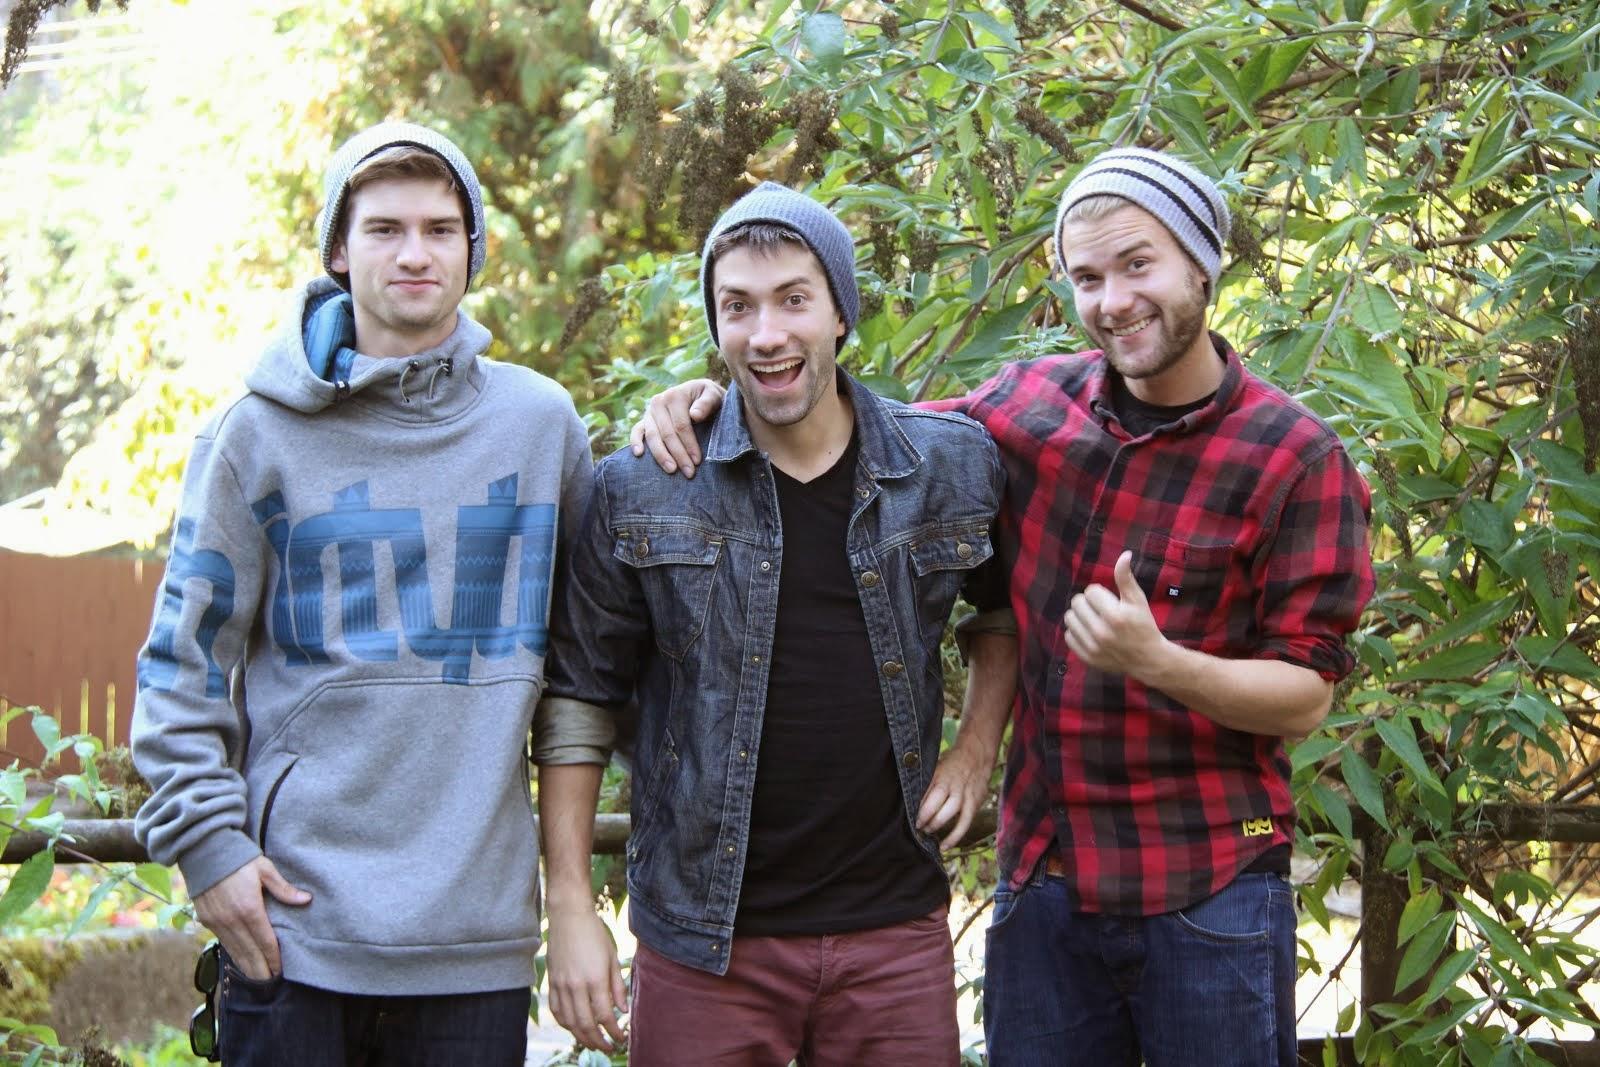 The O Bros